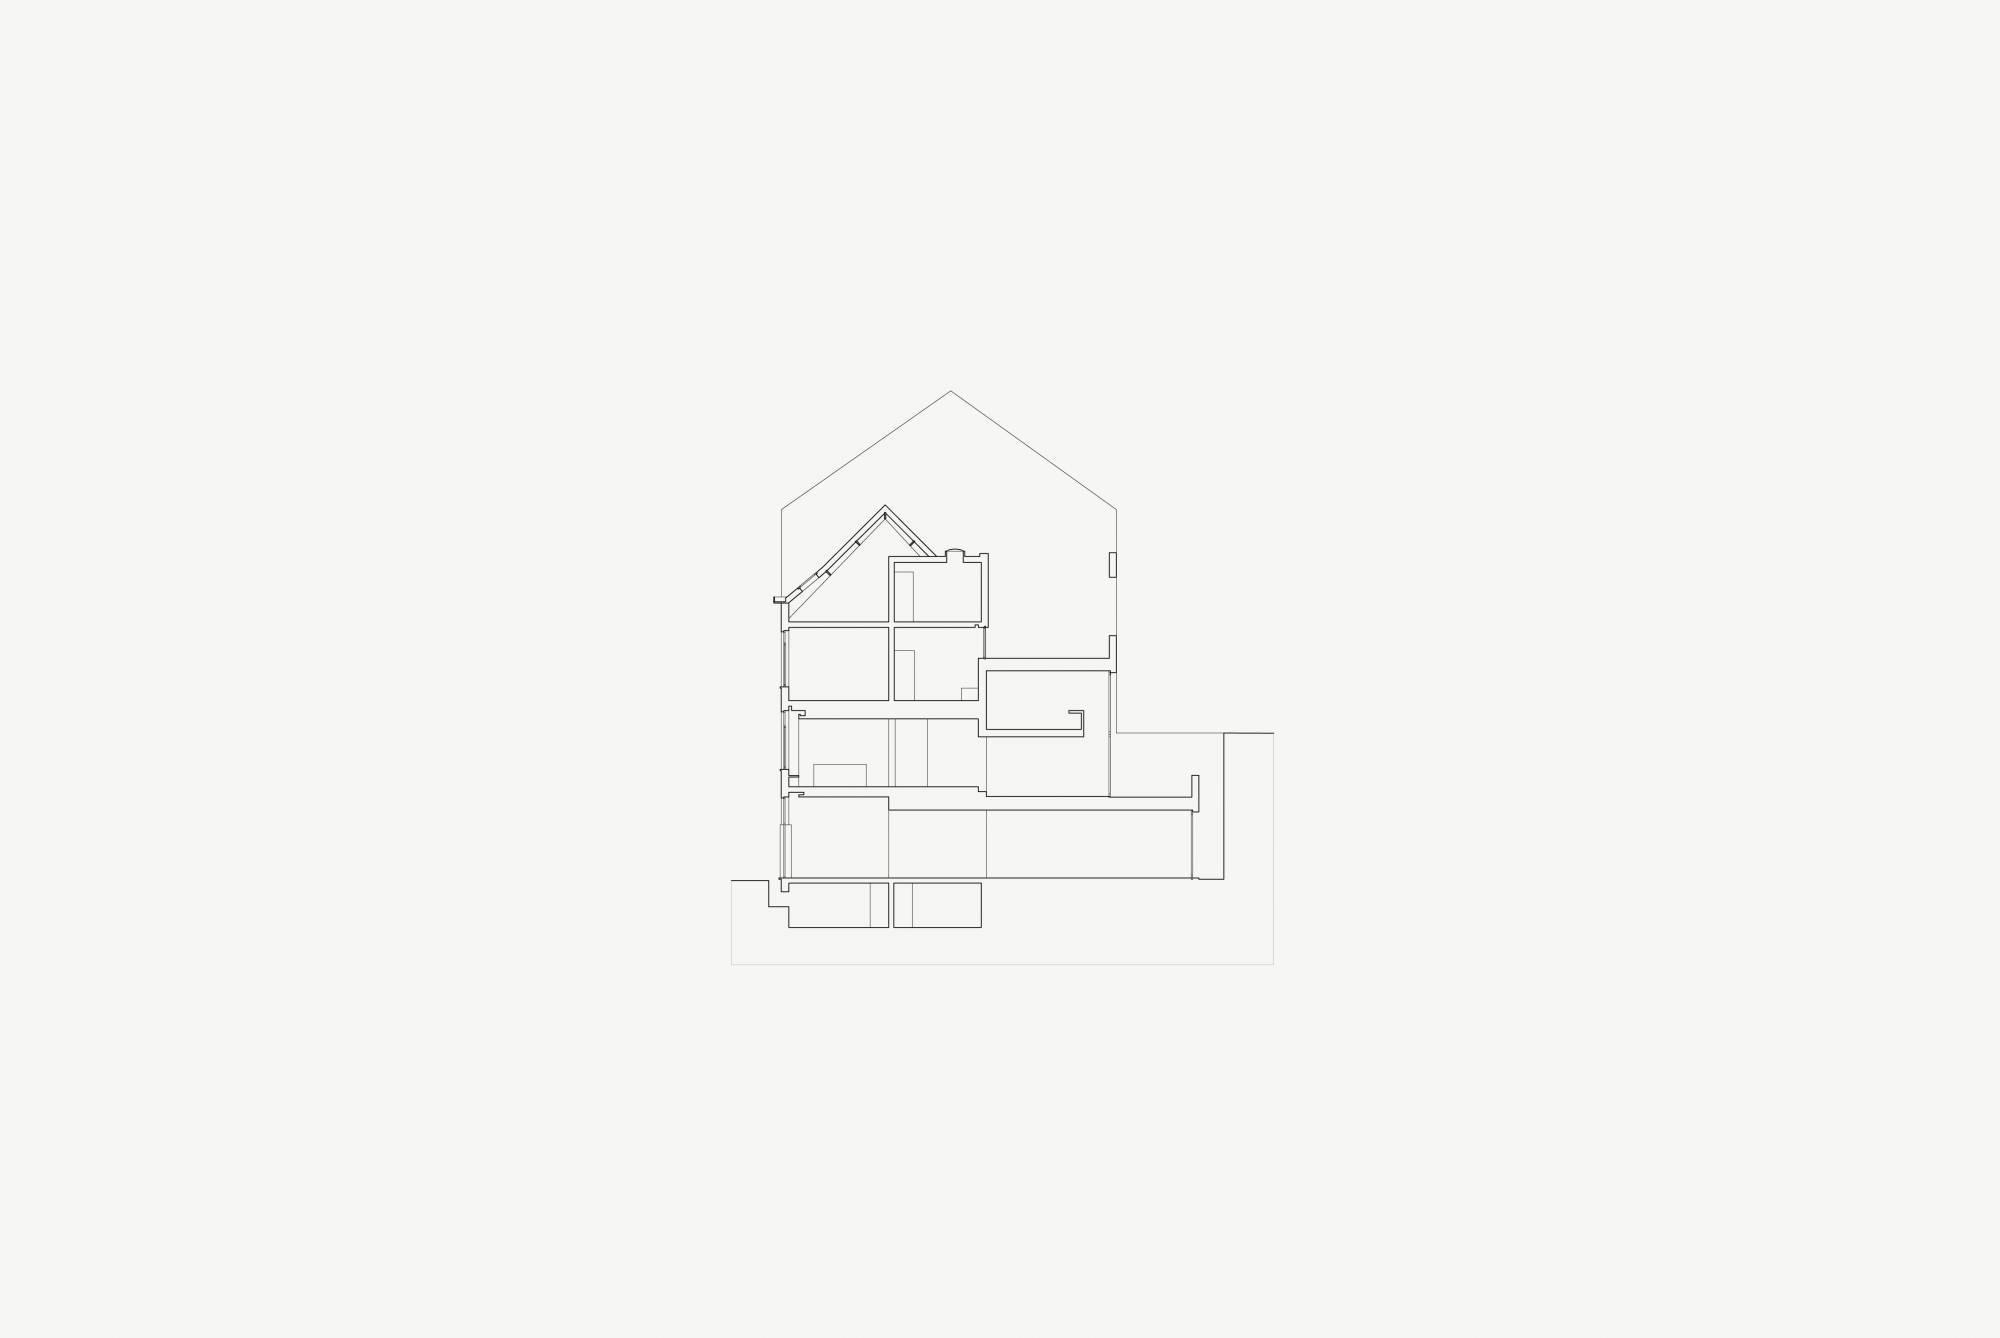 VVDA_RA Residence_Presentation Plans_2